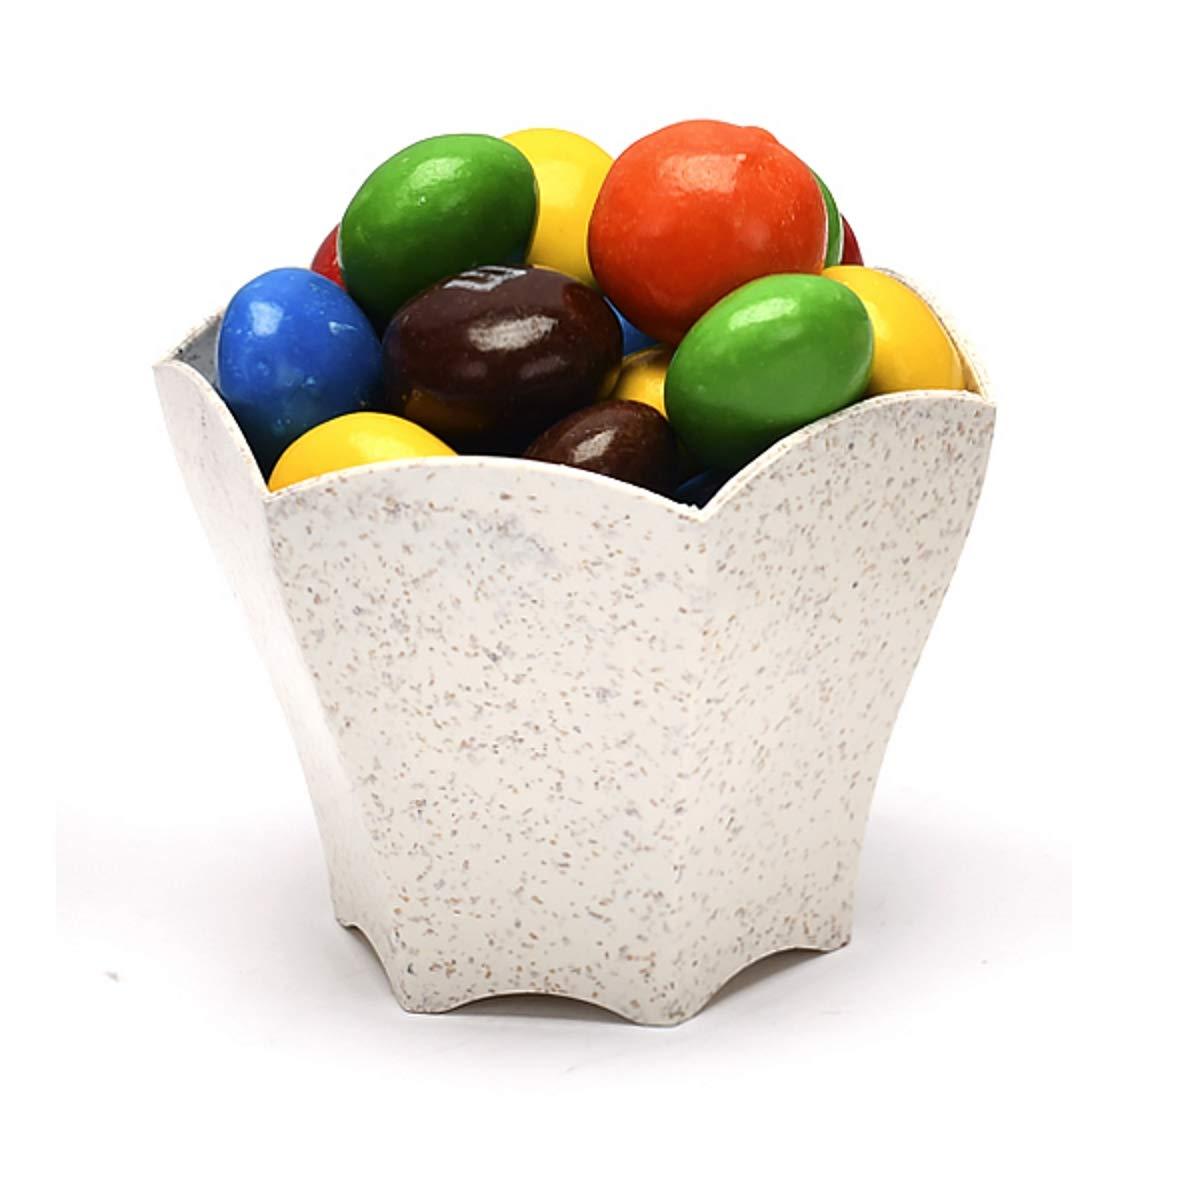 50 Mini Dessert Cups 70 ml (2.4 oz) – Eco-Friendly Wheat Straw – Flower Shape – Ice Cream, Nuts, Candy, Fruit, and Snacks